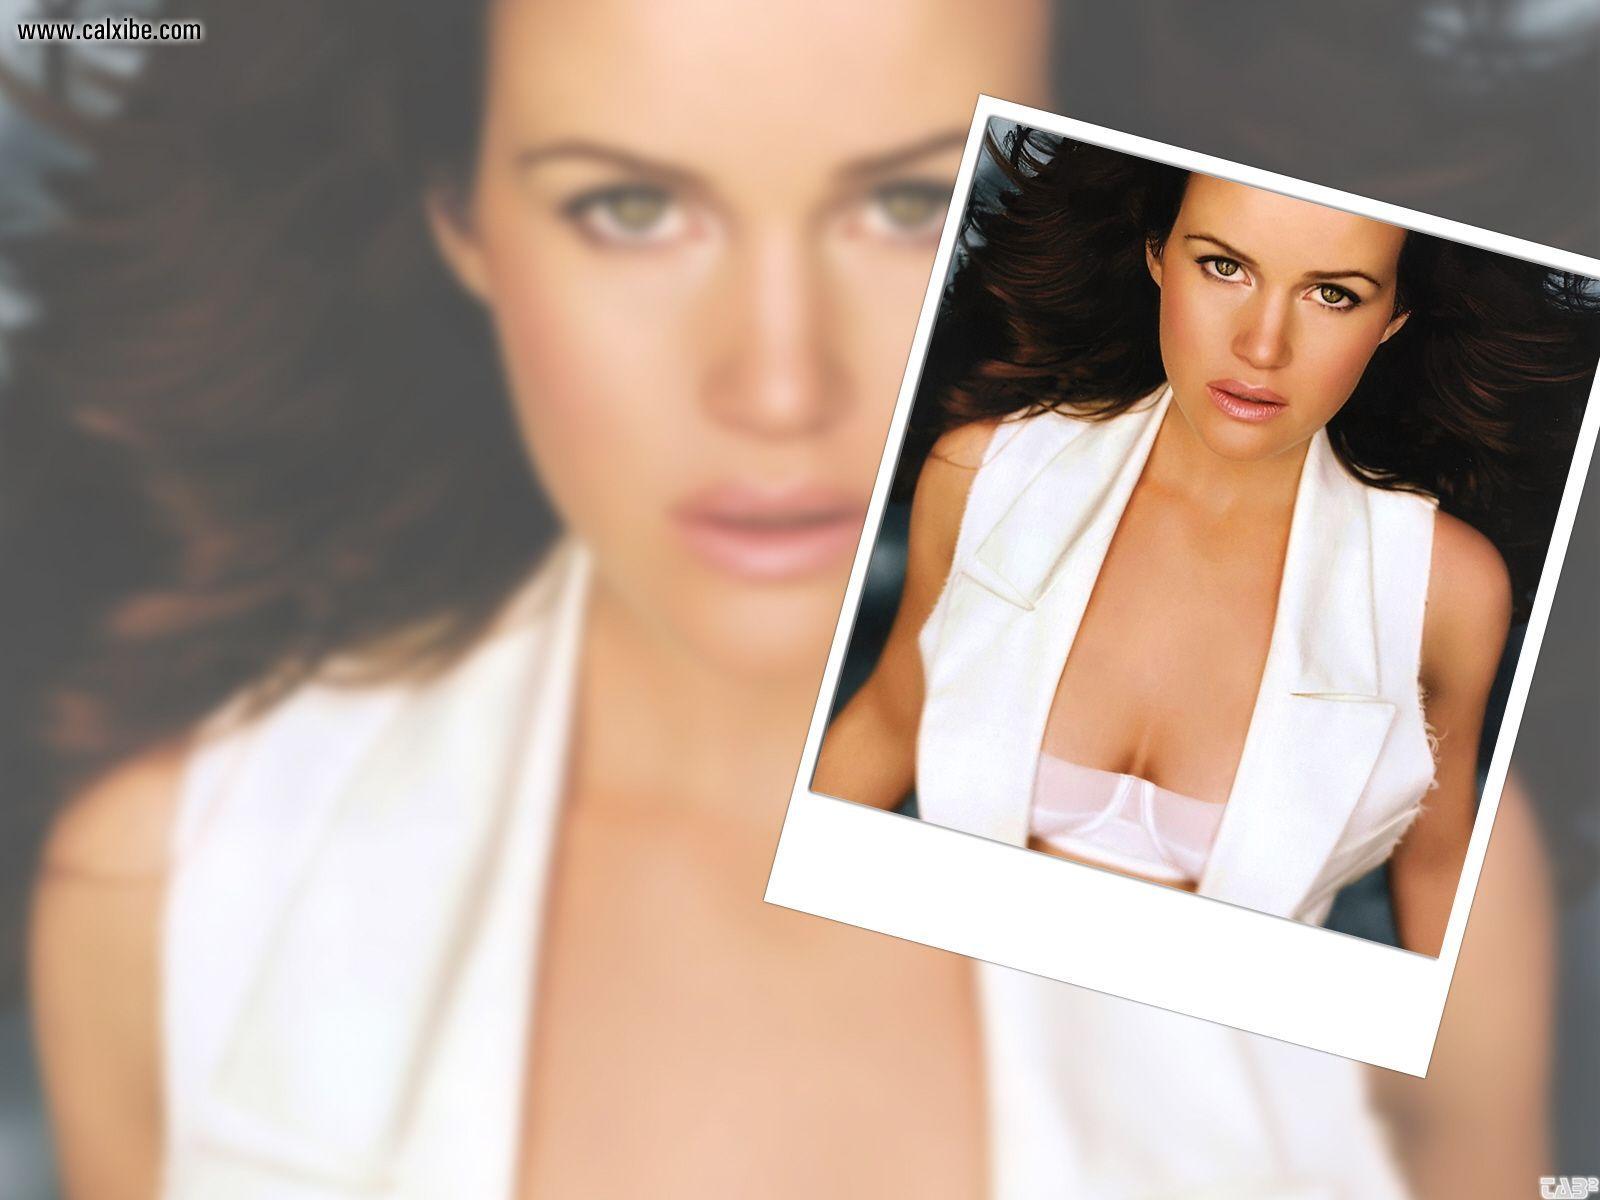 http://1.bp.blogspot.com/-1i-vkizQBgM/TfMzPcBKE5I/AAAAAAAACWs/qptlqnLgg4I/s1600/Carla+Gugino+wallpaper+%25282%2529.jpg